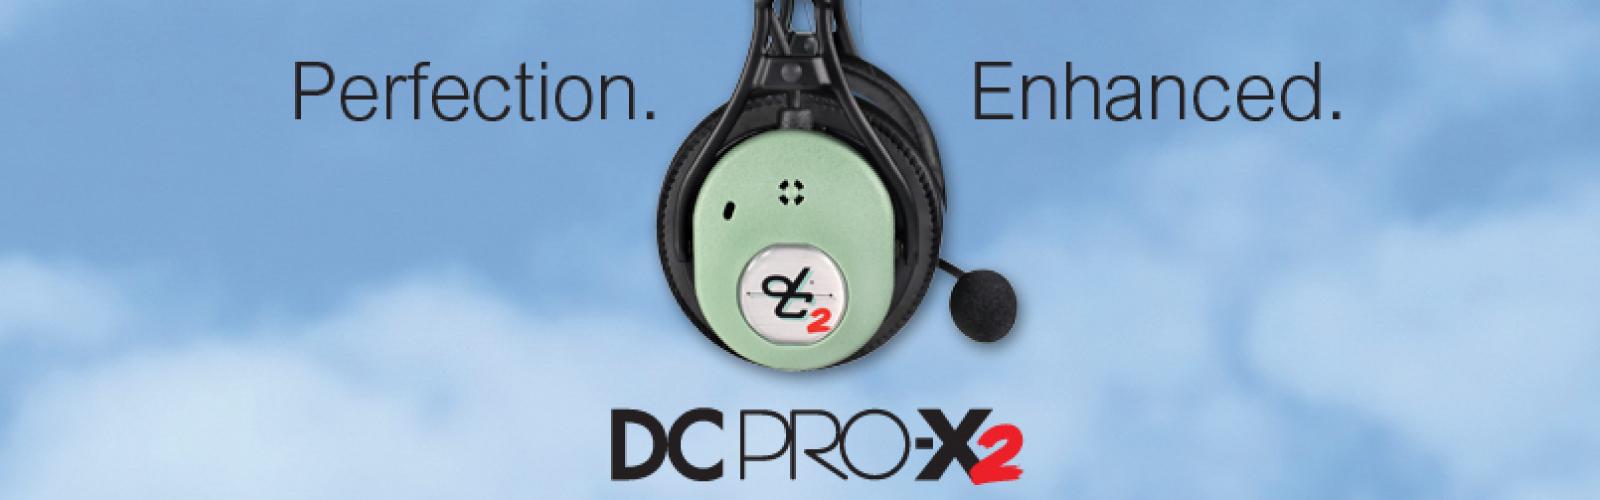 David Clark Pro X2 Headset